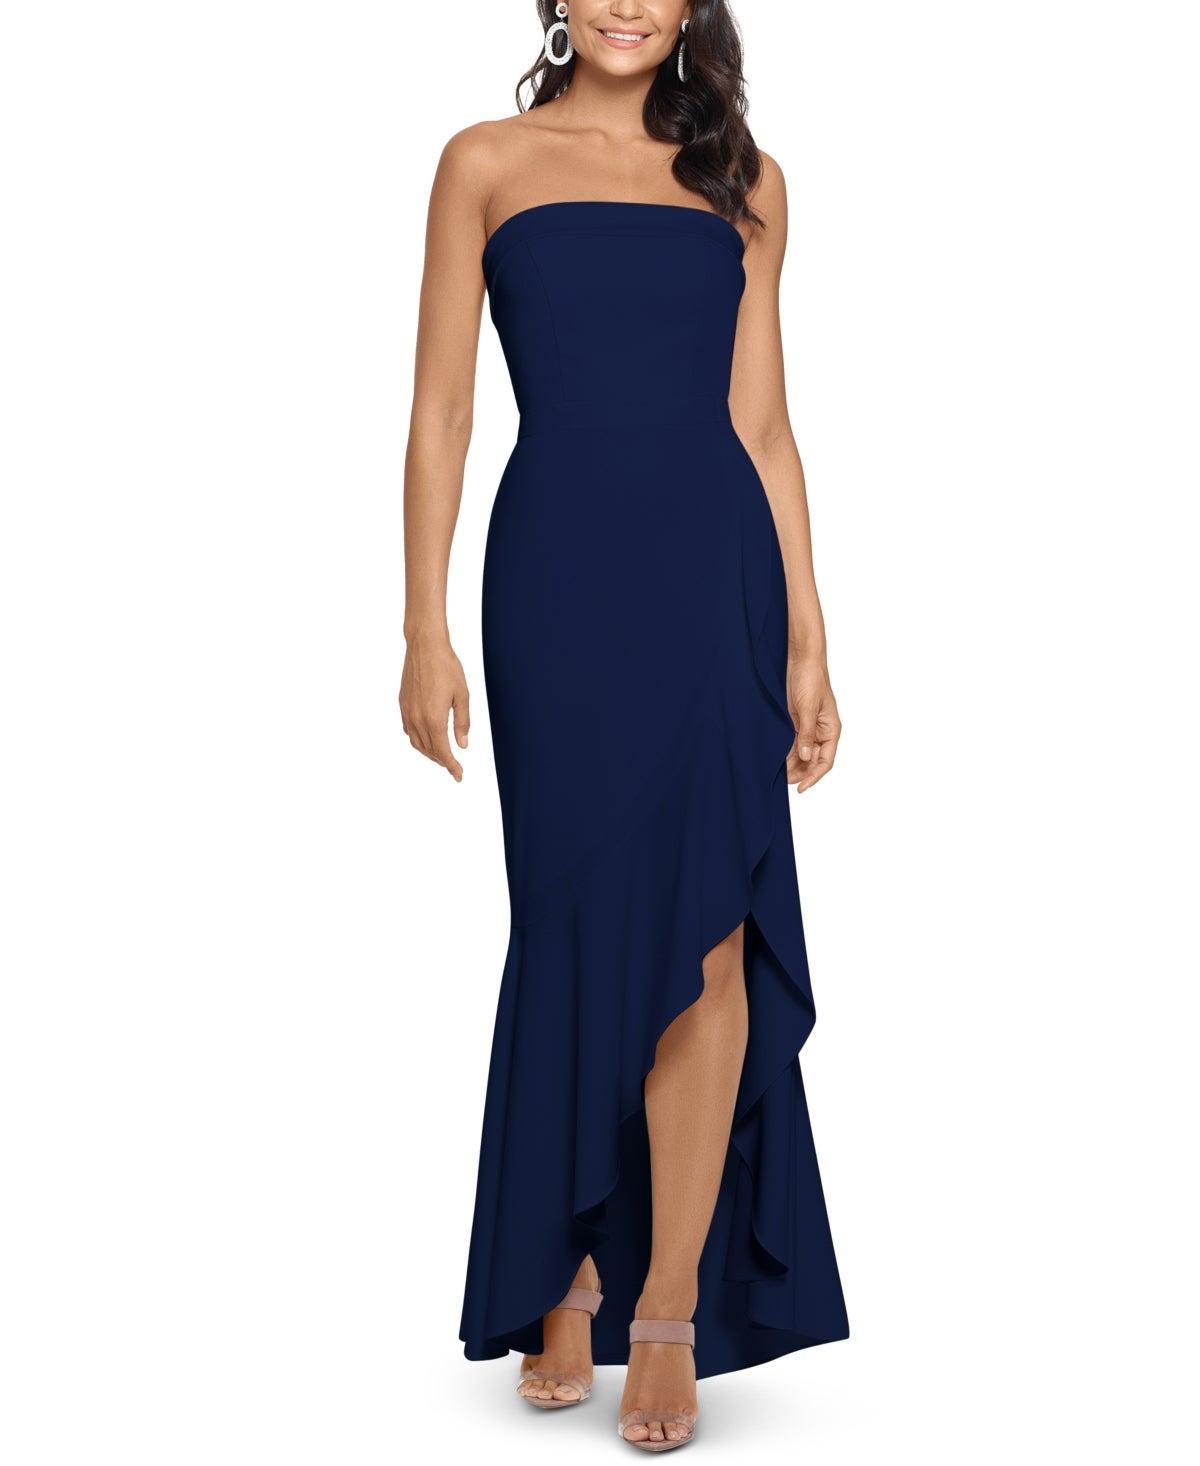 Xscape Women's Dress Blue Size 6 Sheath Strapless Ruffle Slit Maxi